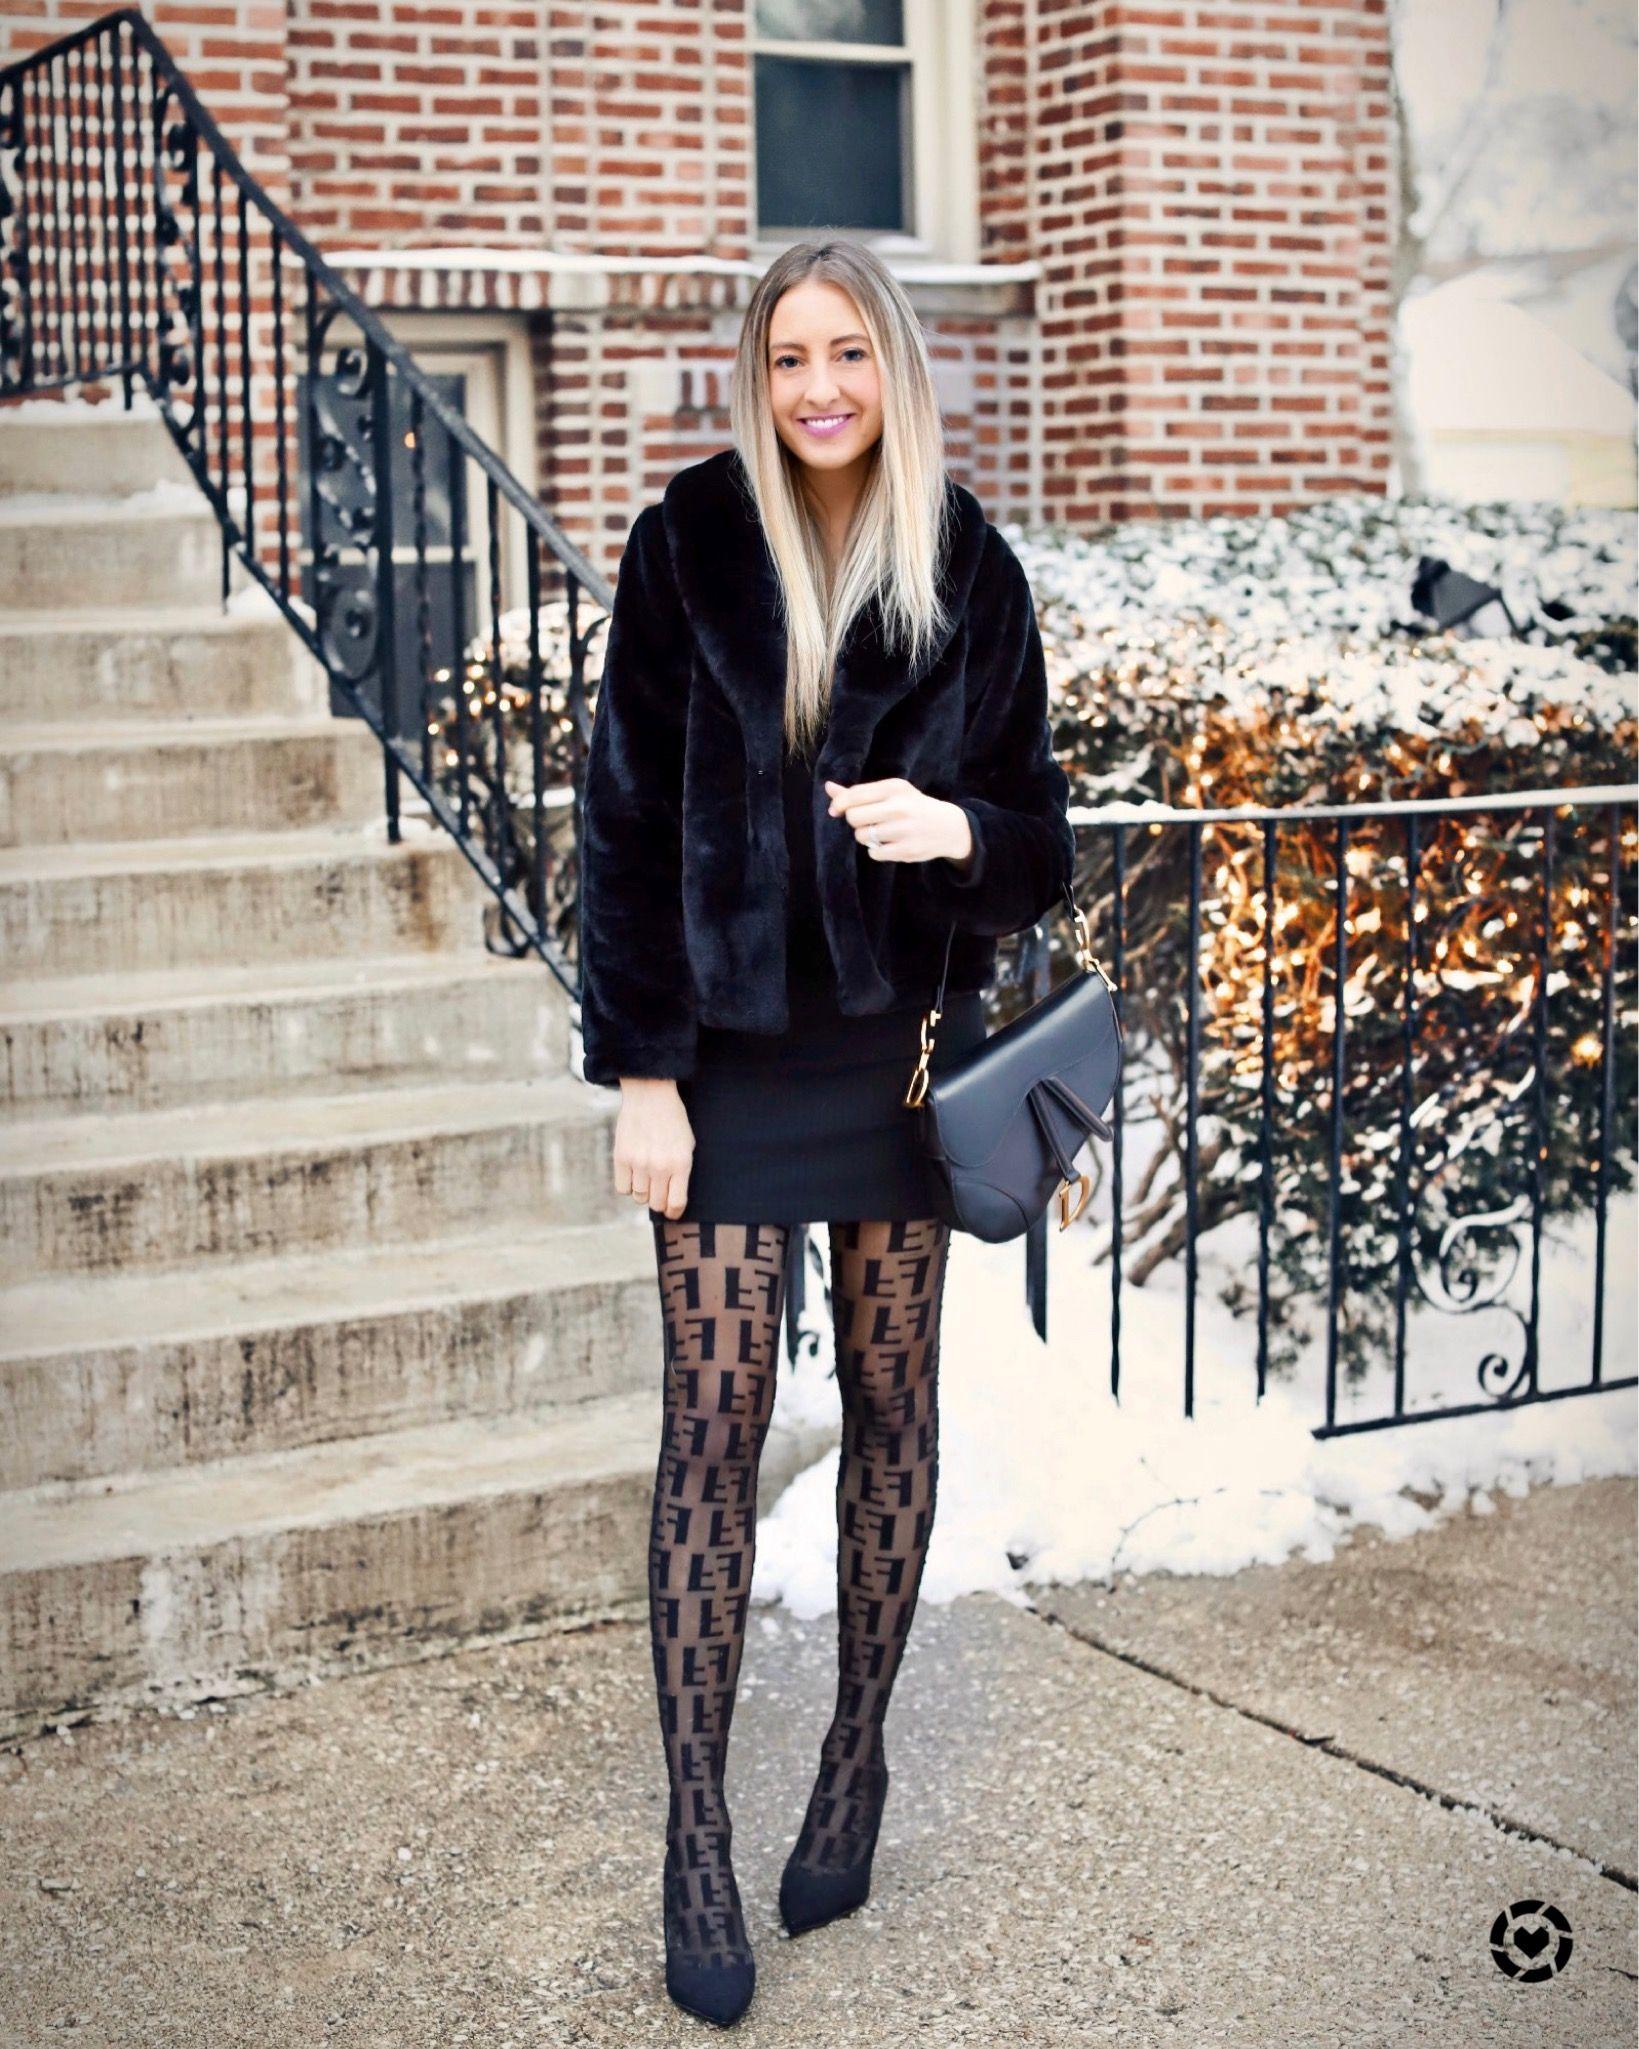 Fendi Tights Black Dress Winter Fashion Black Dress Winter Winter Dresses Fendi Tights [ 2049 x 1639 Pixel ]